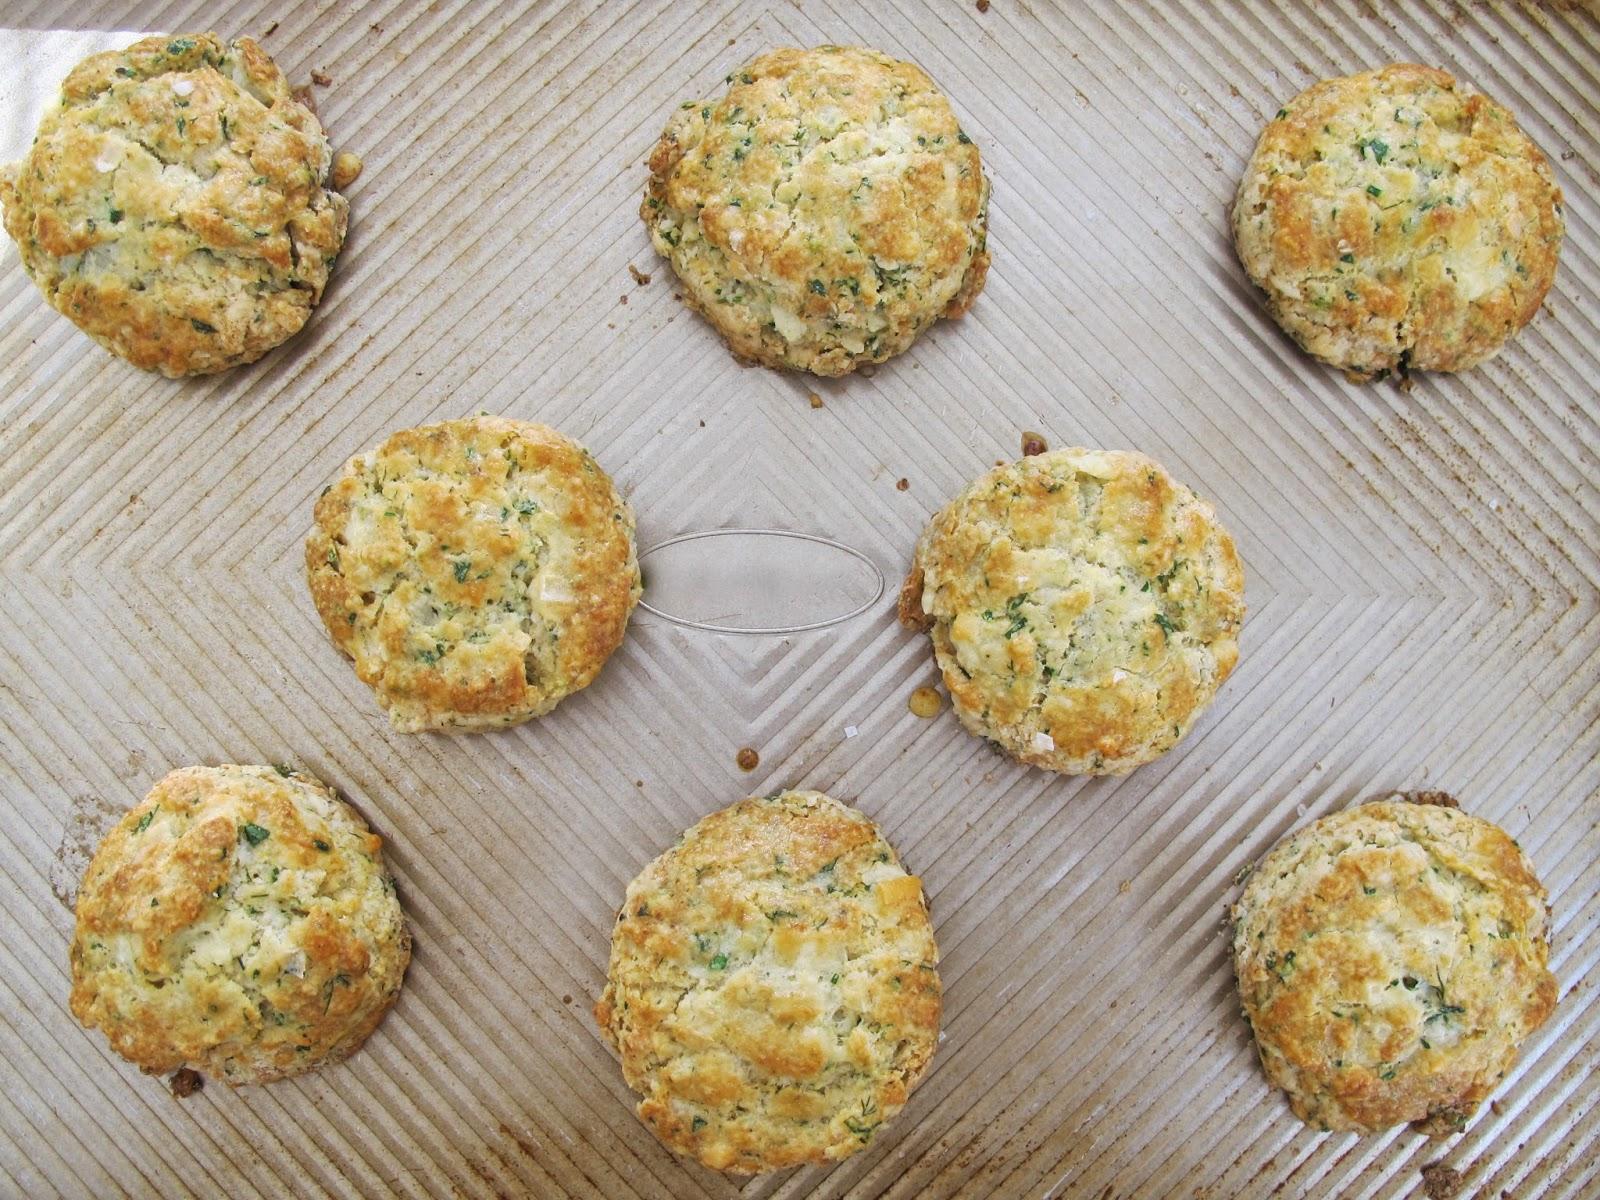 Cheddar Herb Biscuits